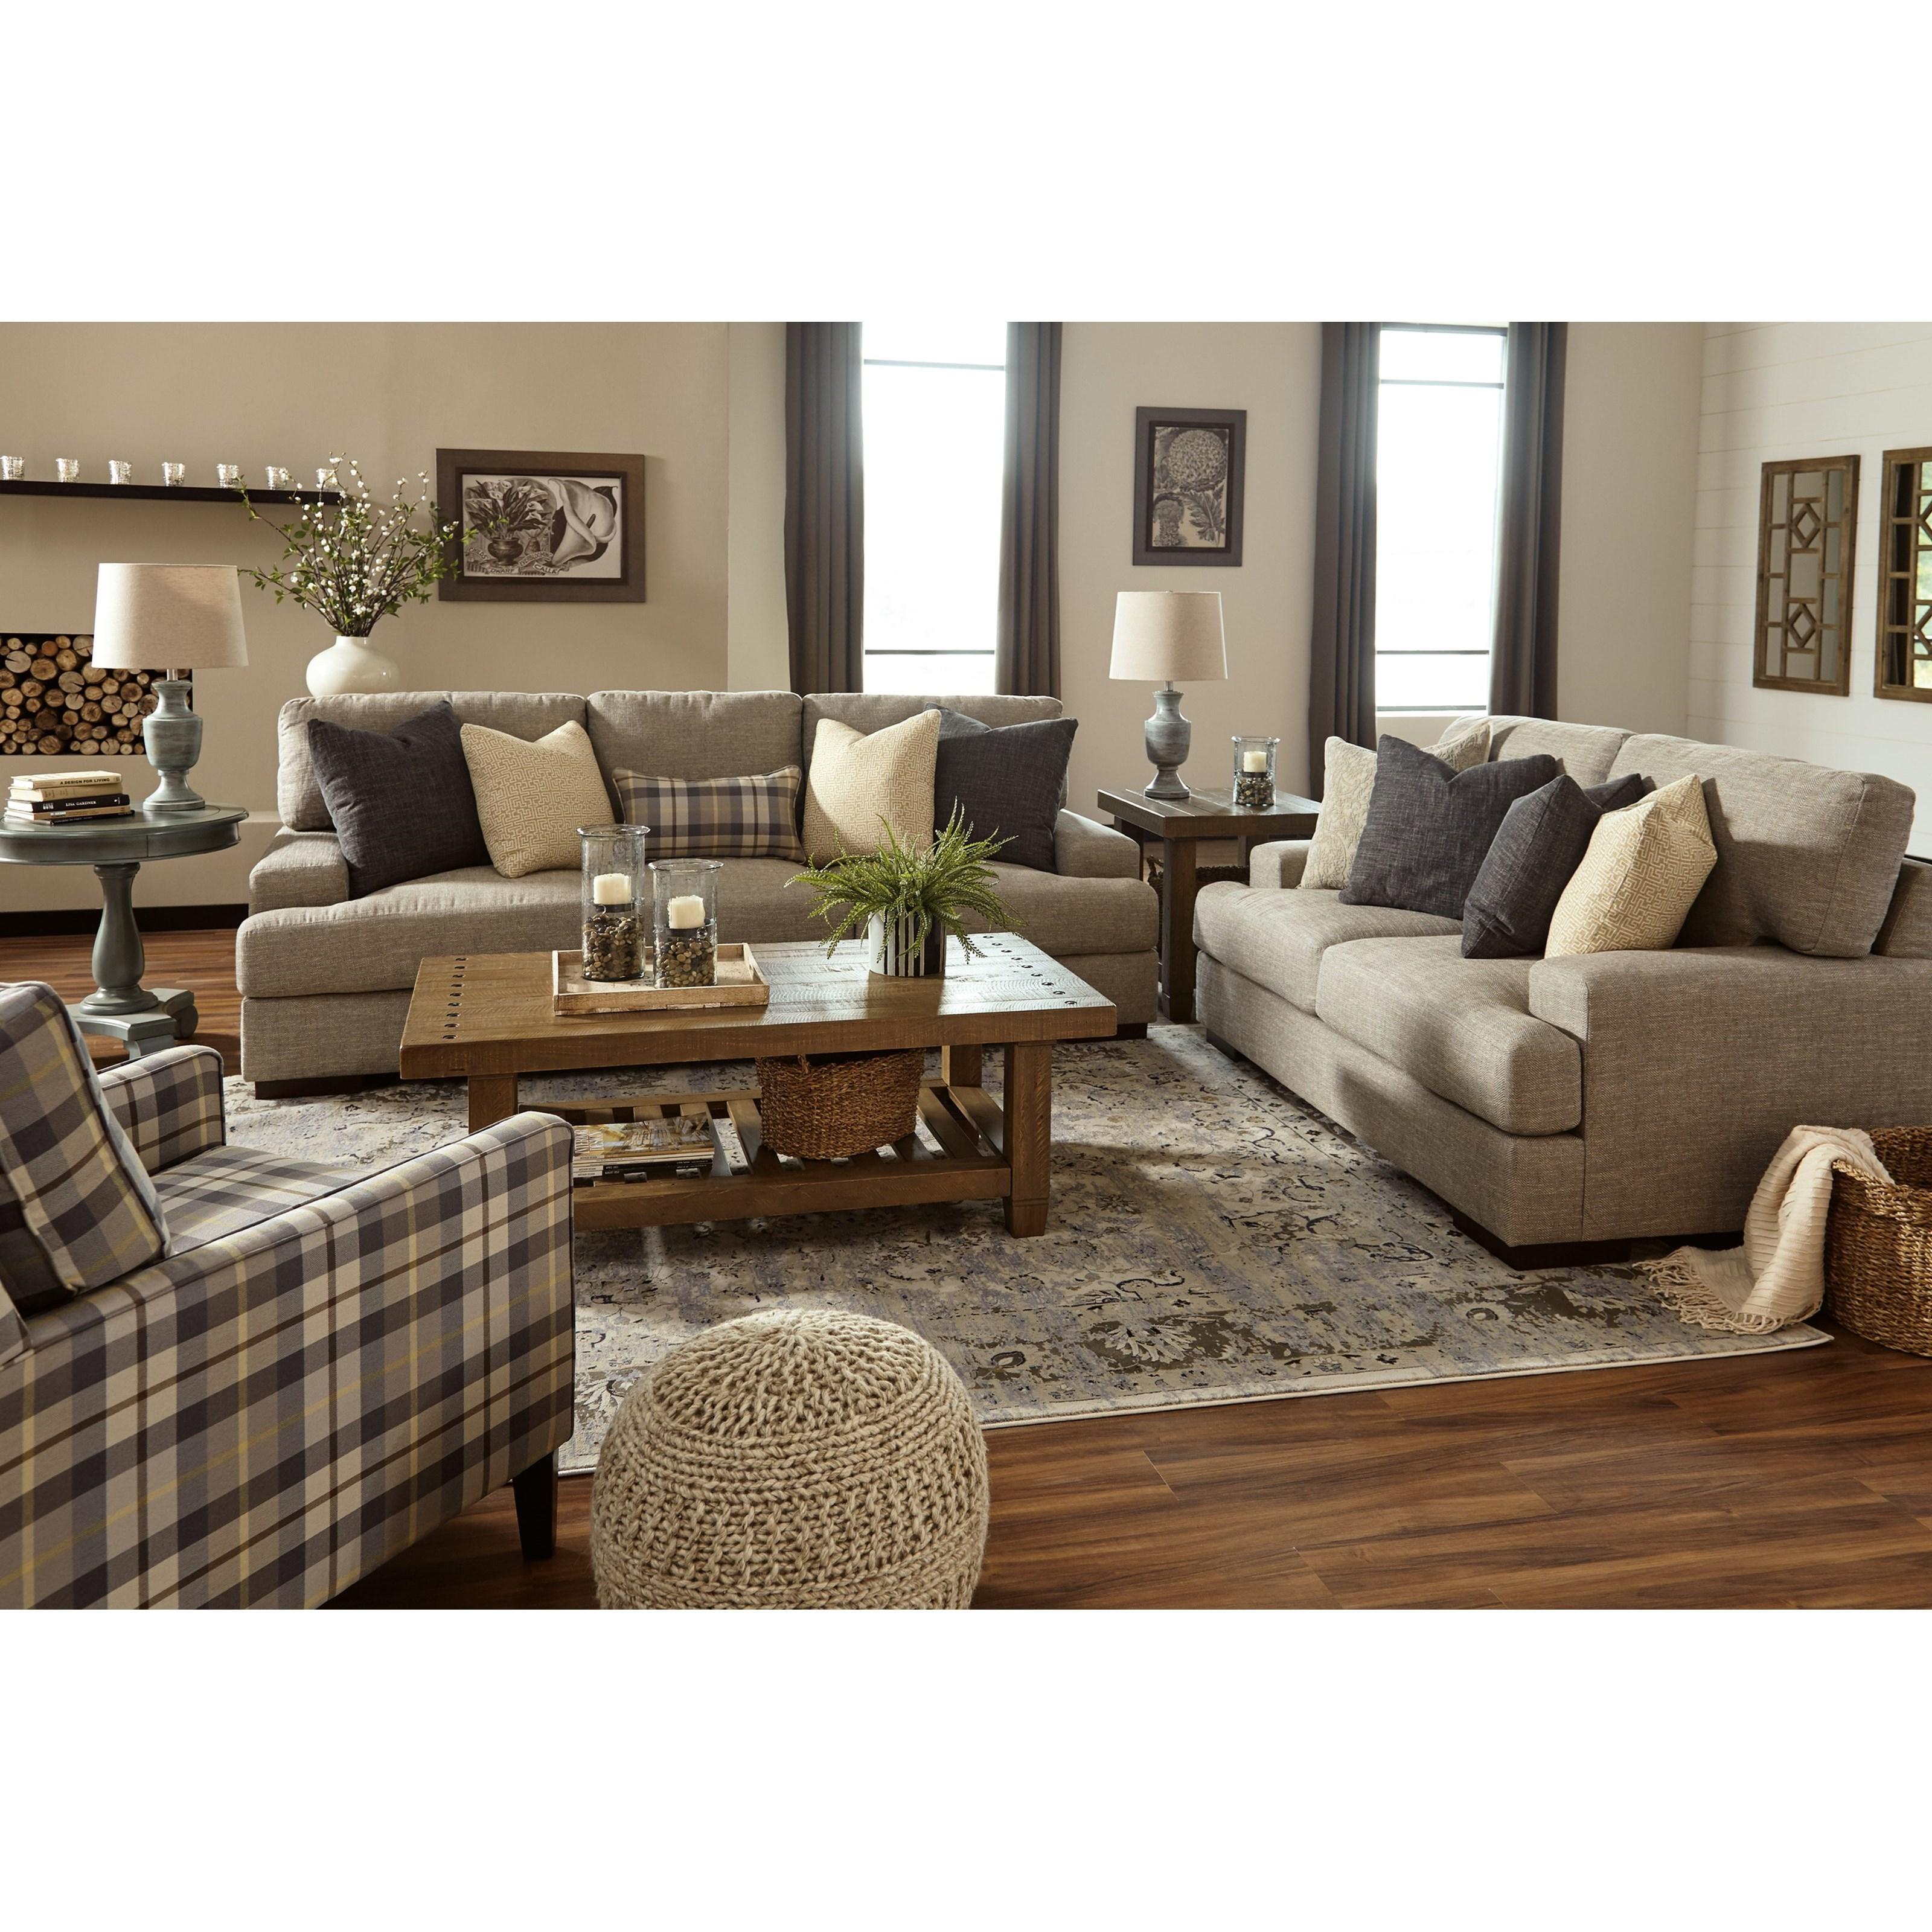 Millennium Austwell Living Room Group - Item Number: 55901 Living Room Group 2